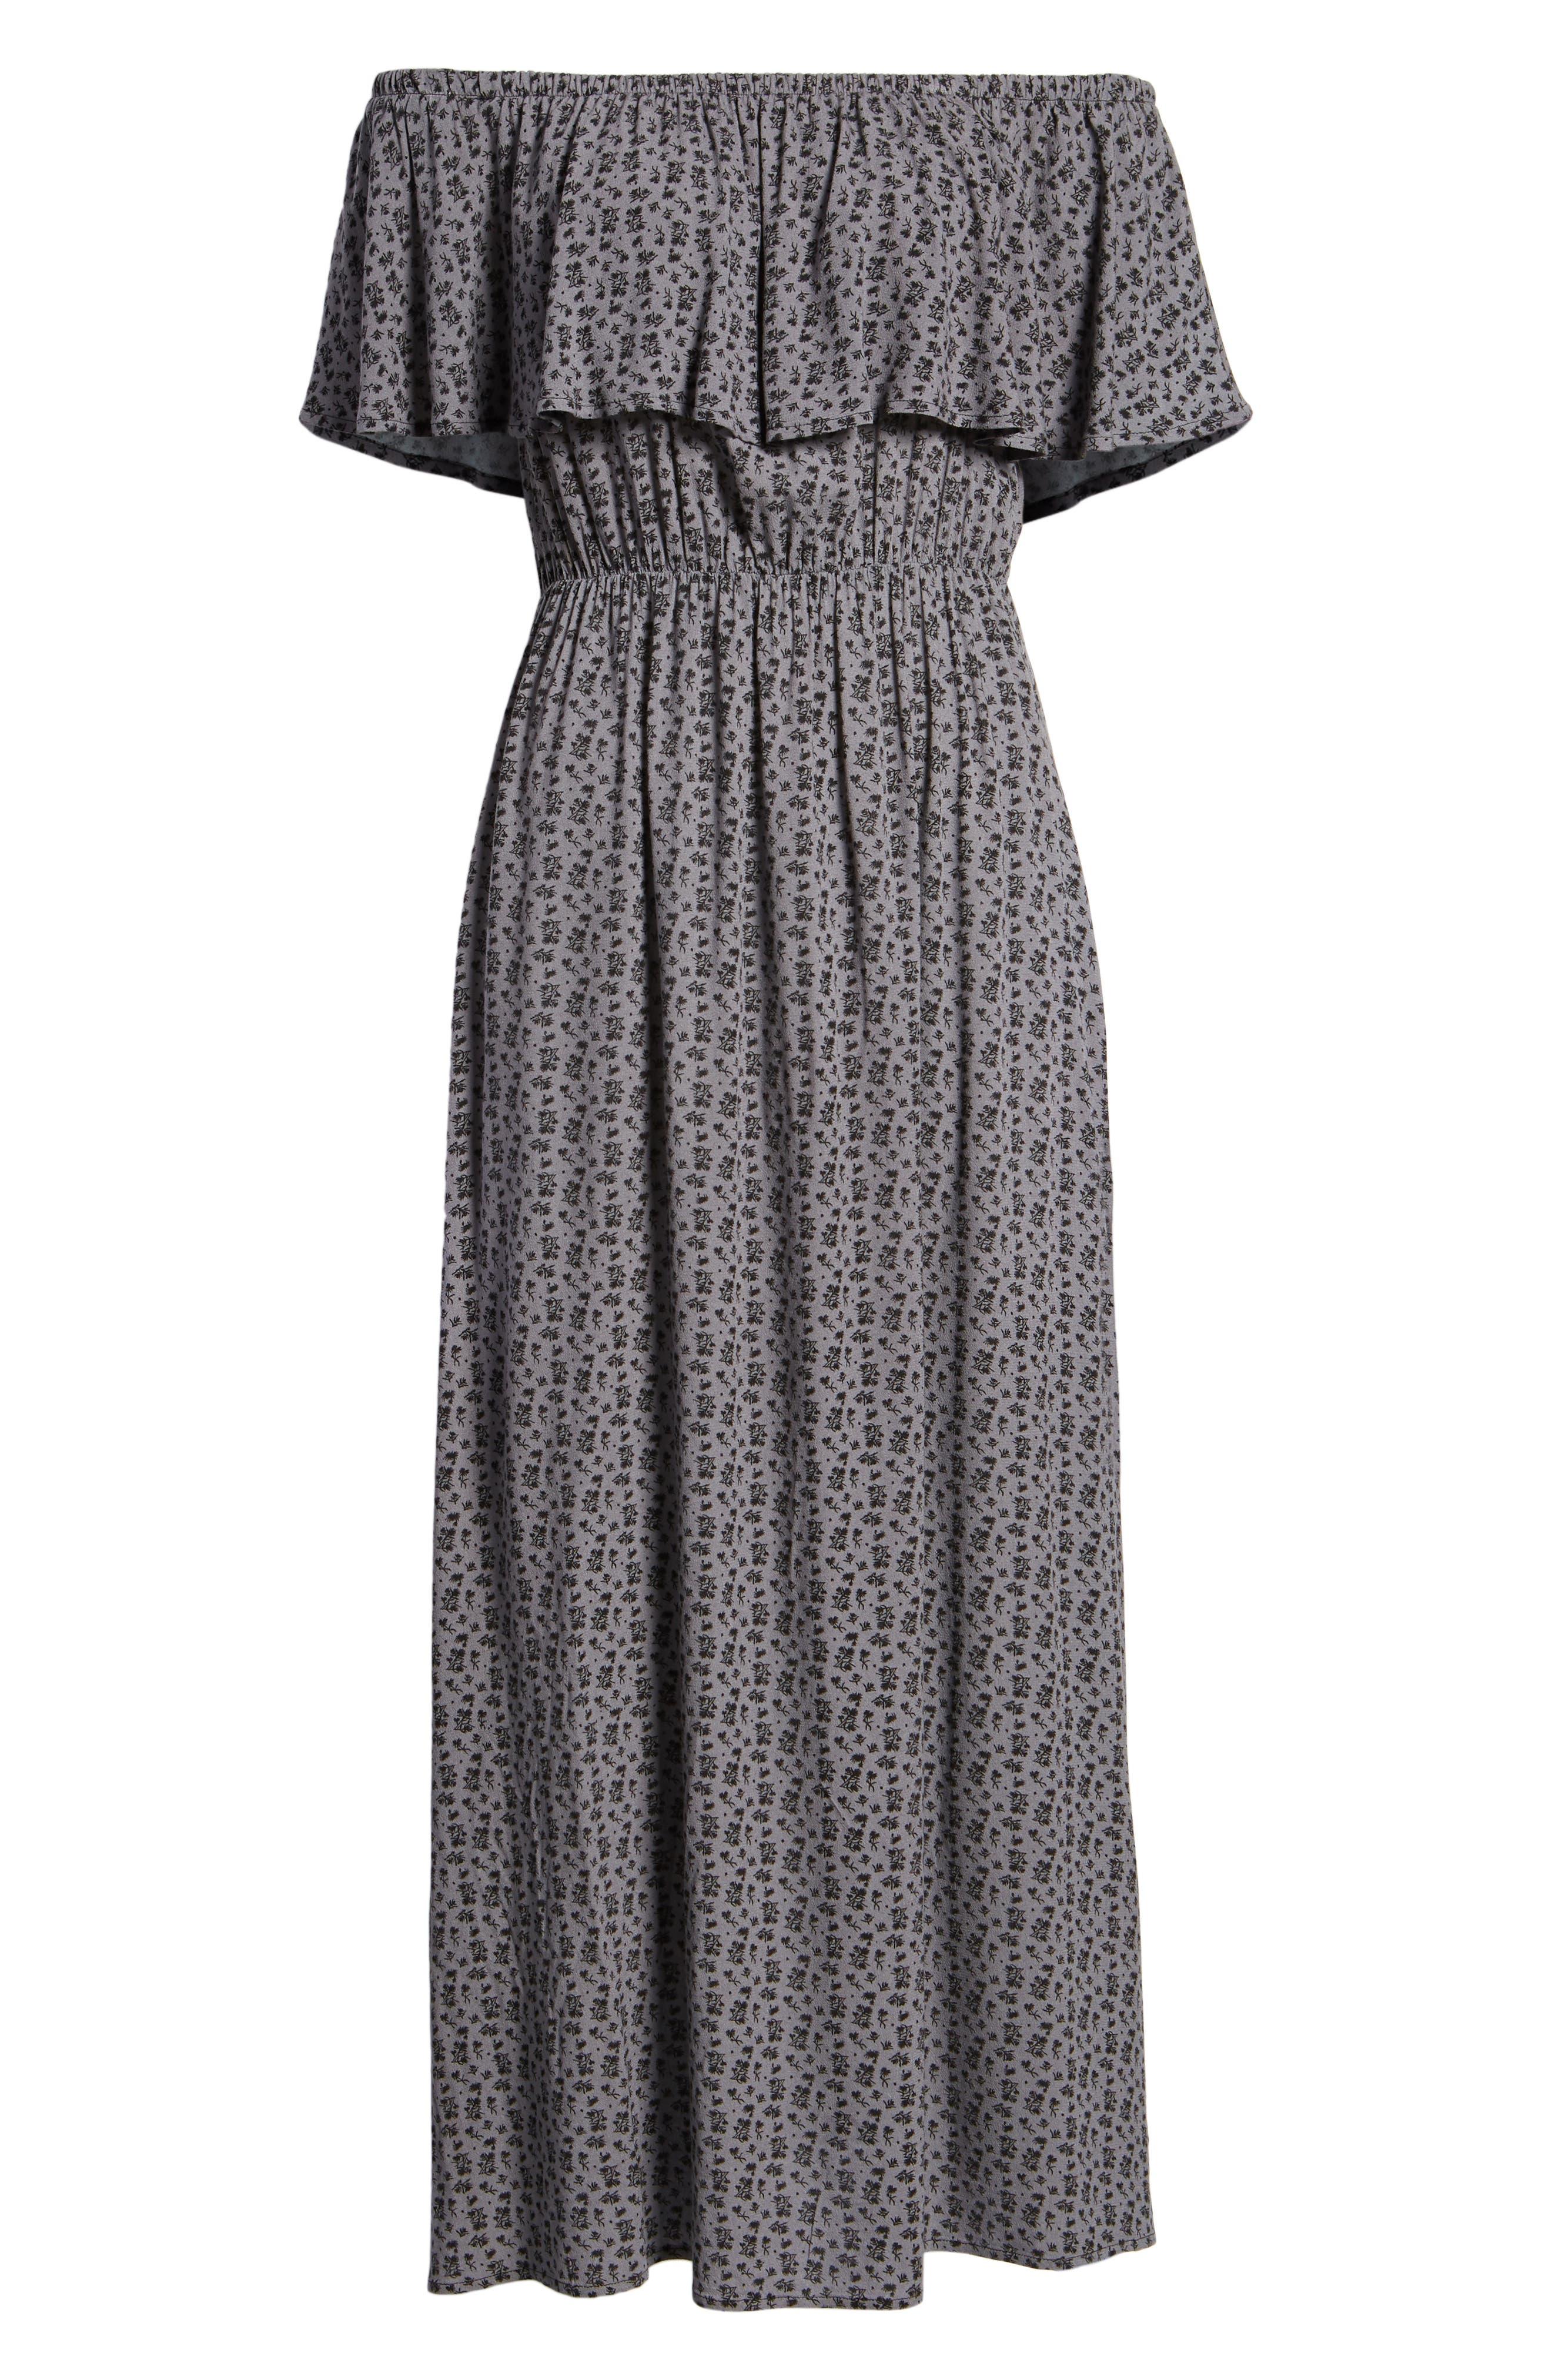 LIRA CLOTHING,                             Marissa Floral Print Off the Shoulder Dress,                             Alternate thumbnail 7, color,                             250